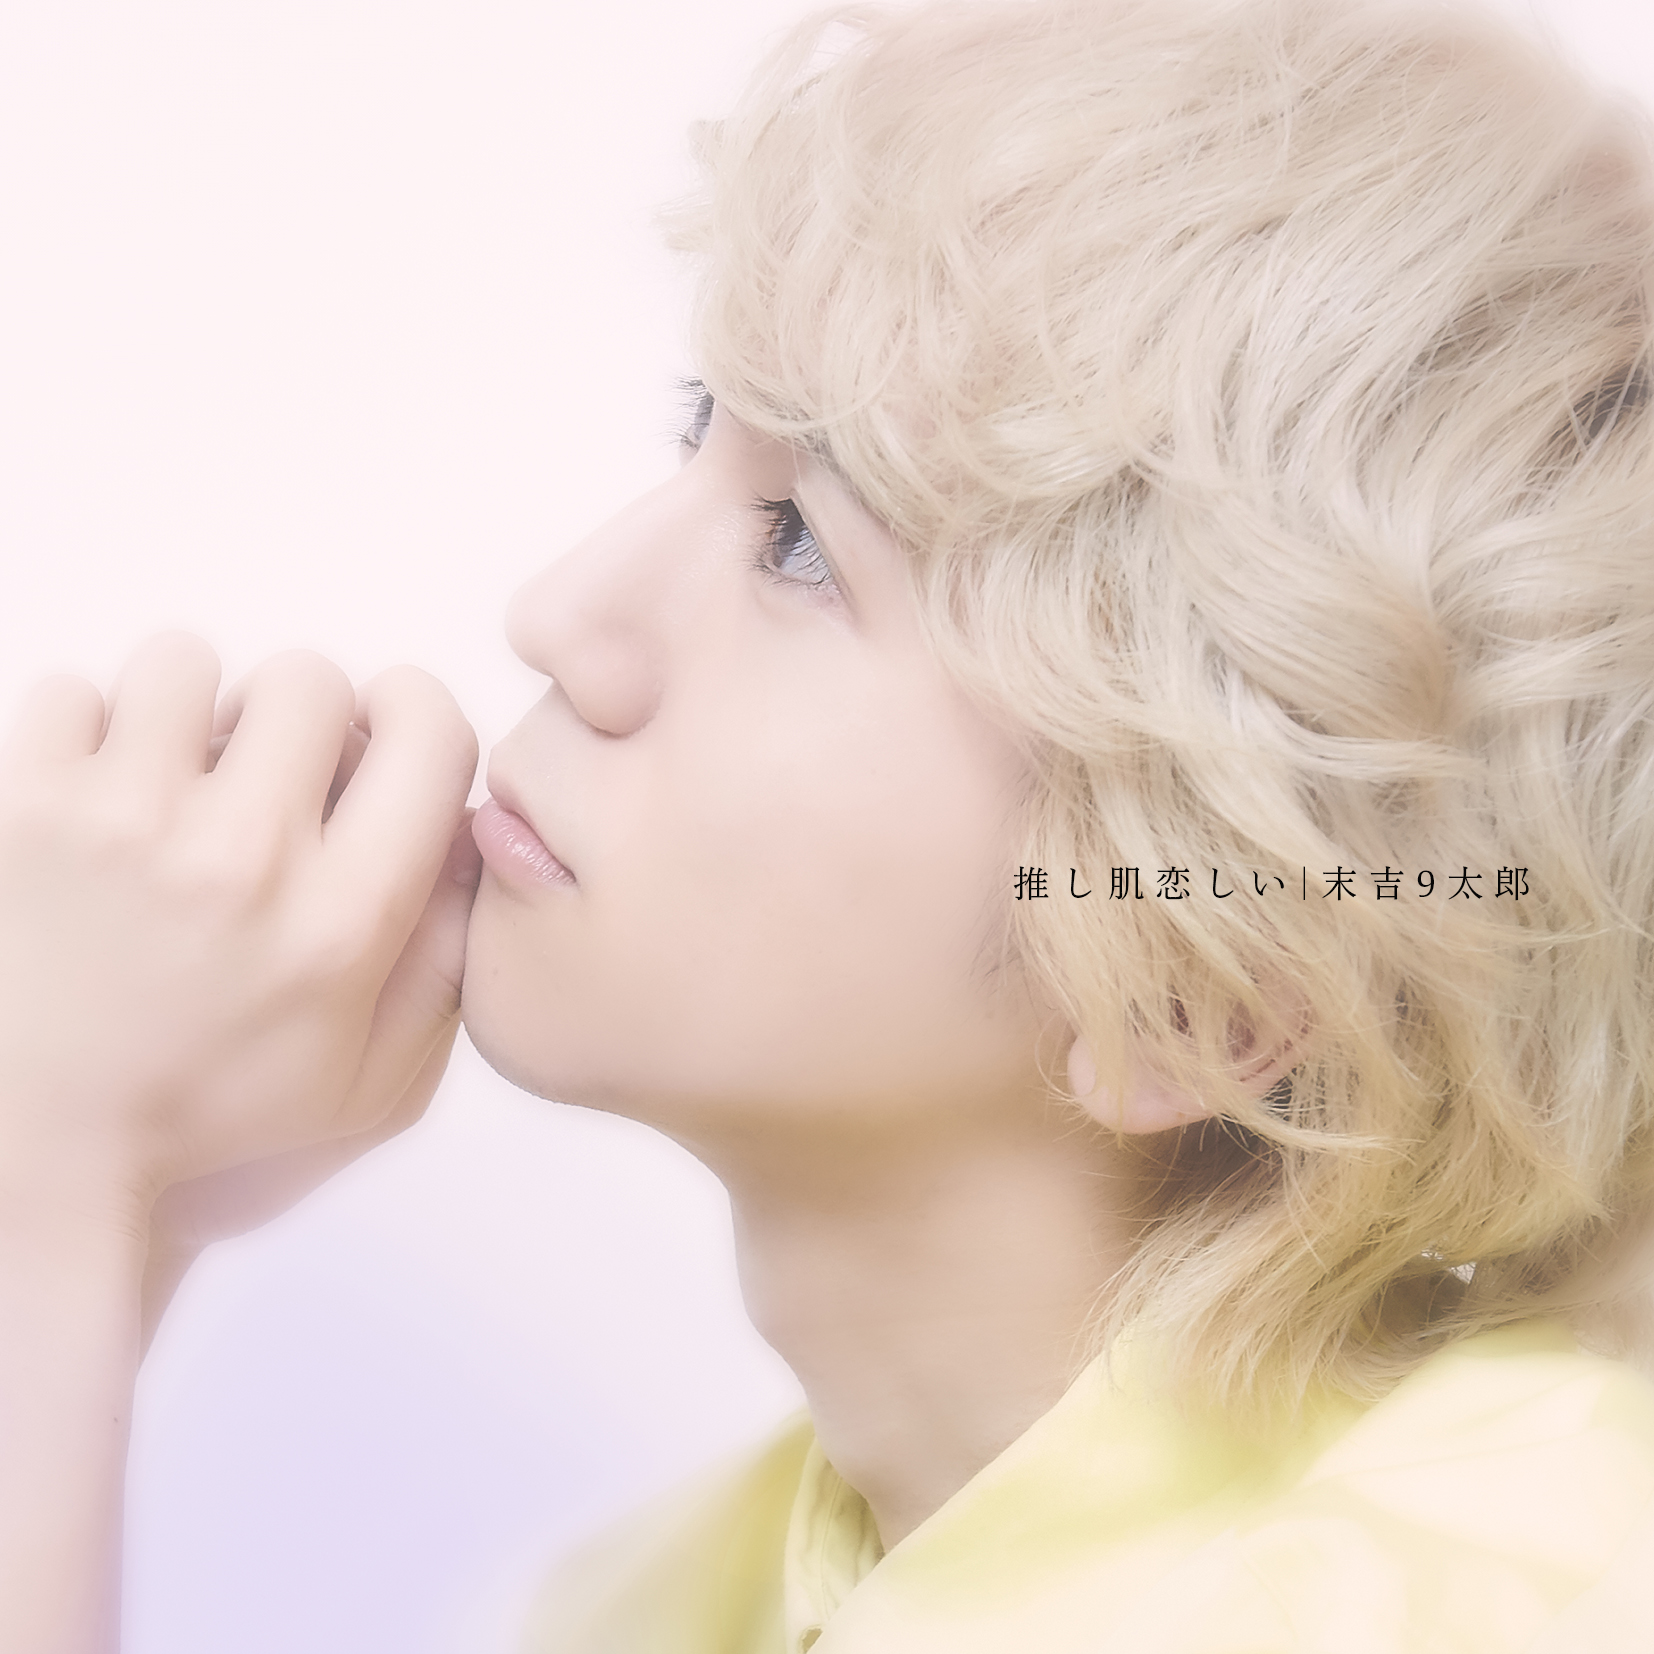 【NEWS】末吉9太郎 ソロ新曲「推し肌恋しい」9/16 配信リリース決定!